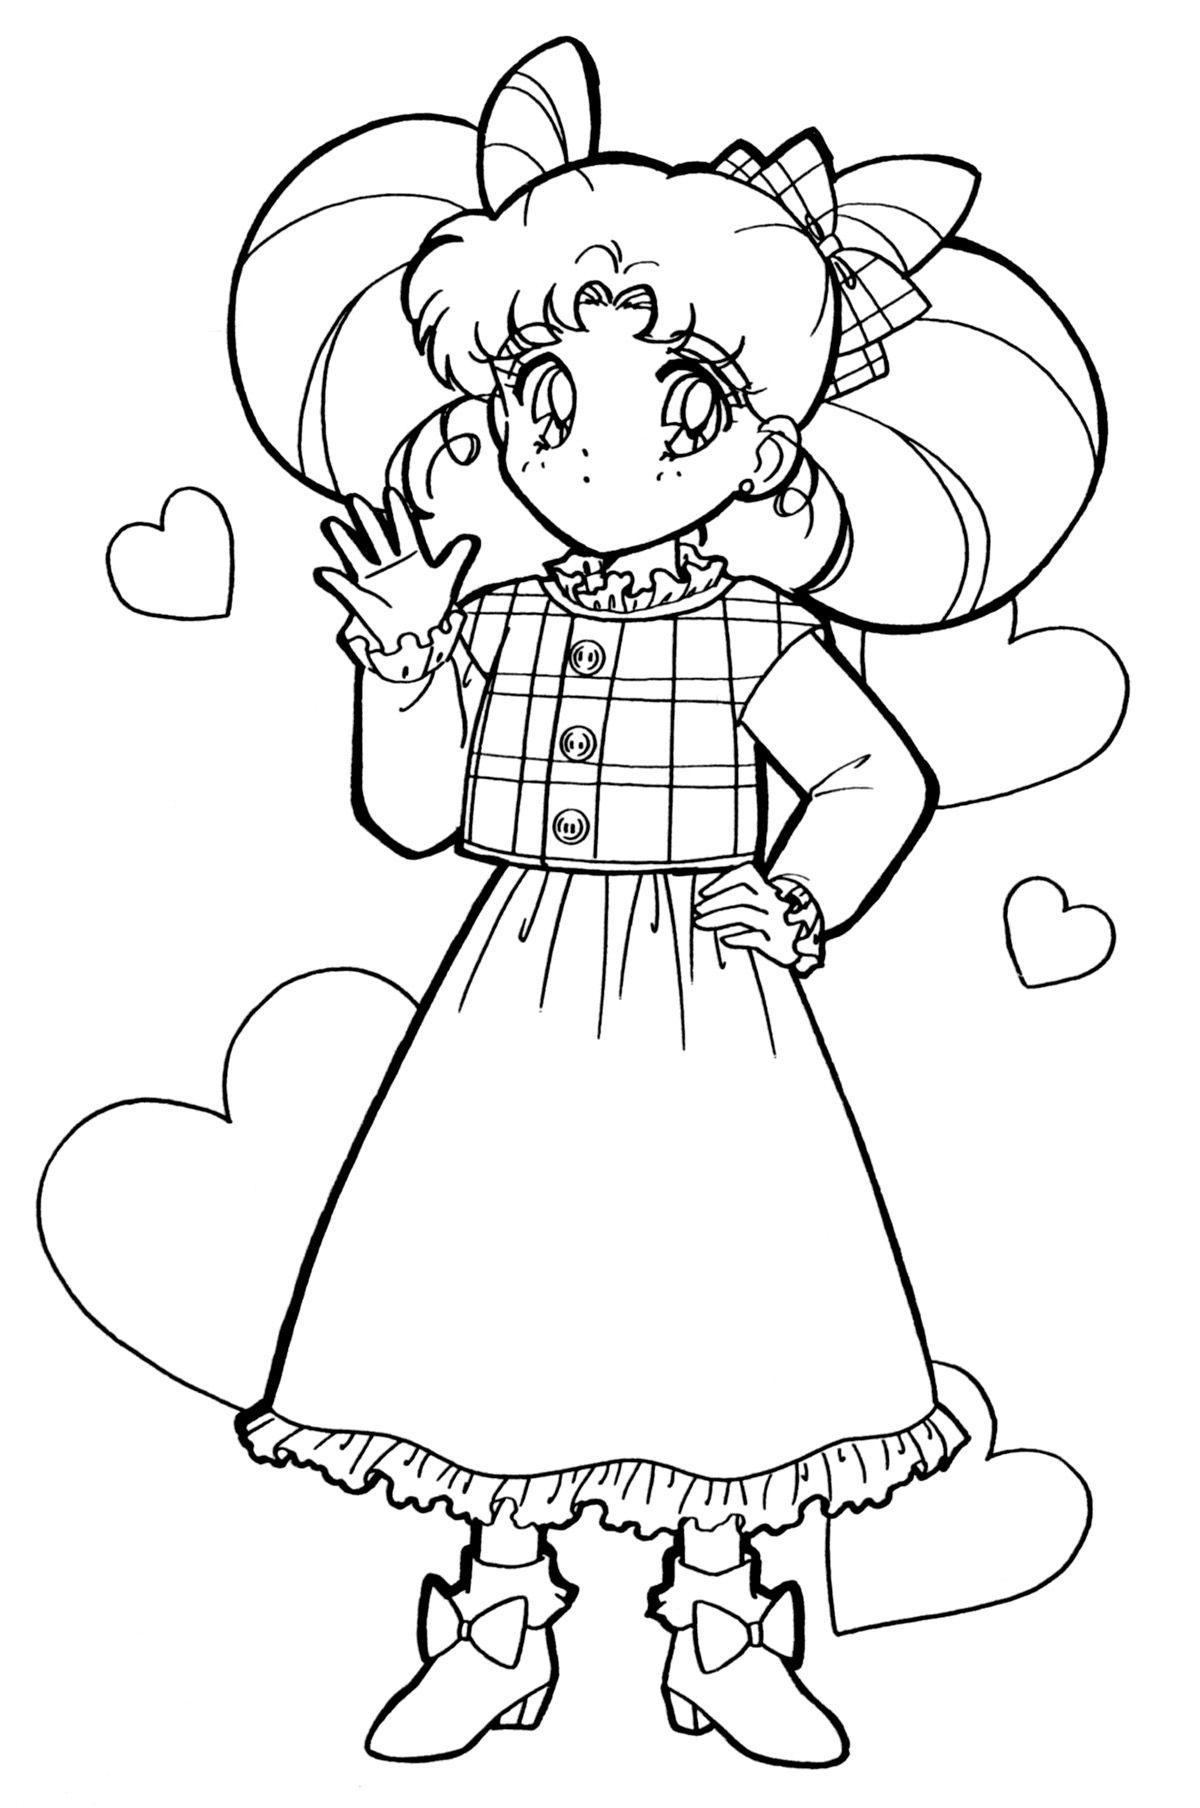 sailor chibi moon | Colouring pages | Pinterest | Sailor chibi moon